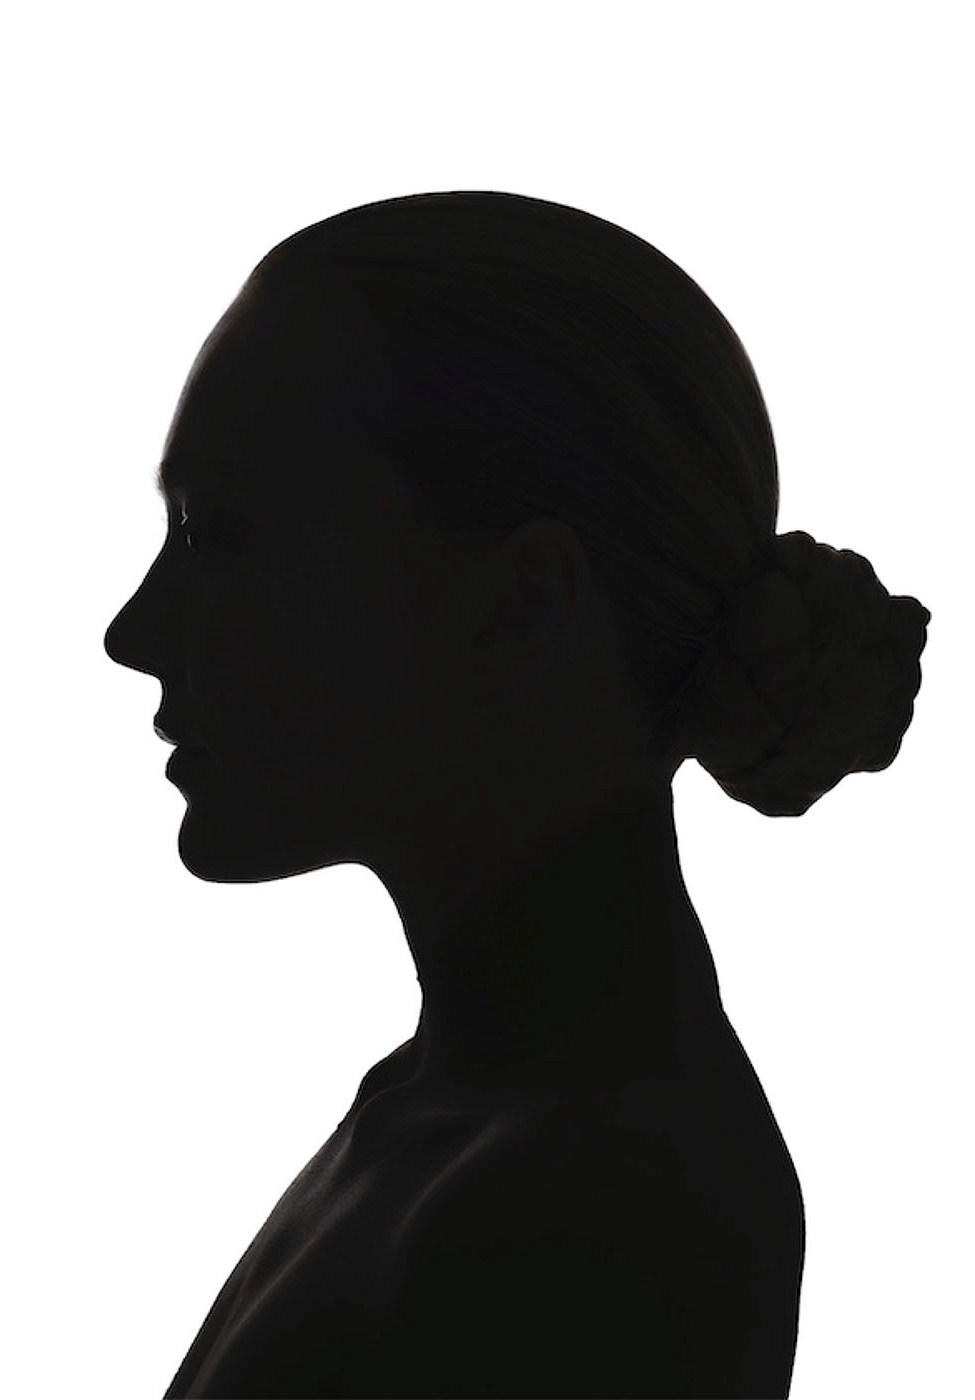 Misia-O-silhouette-2021